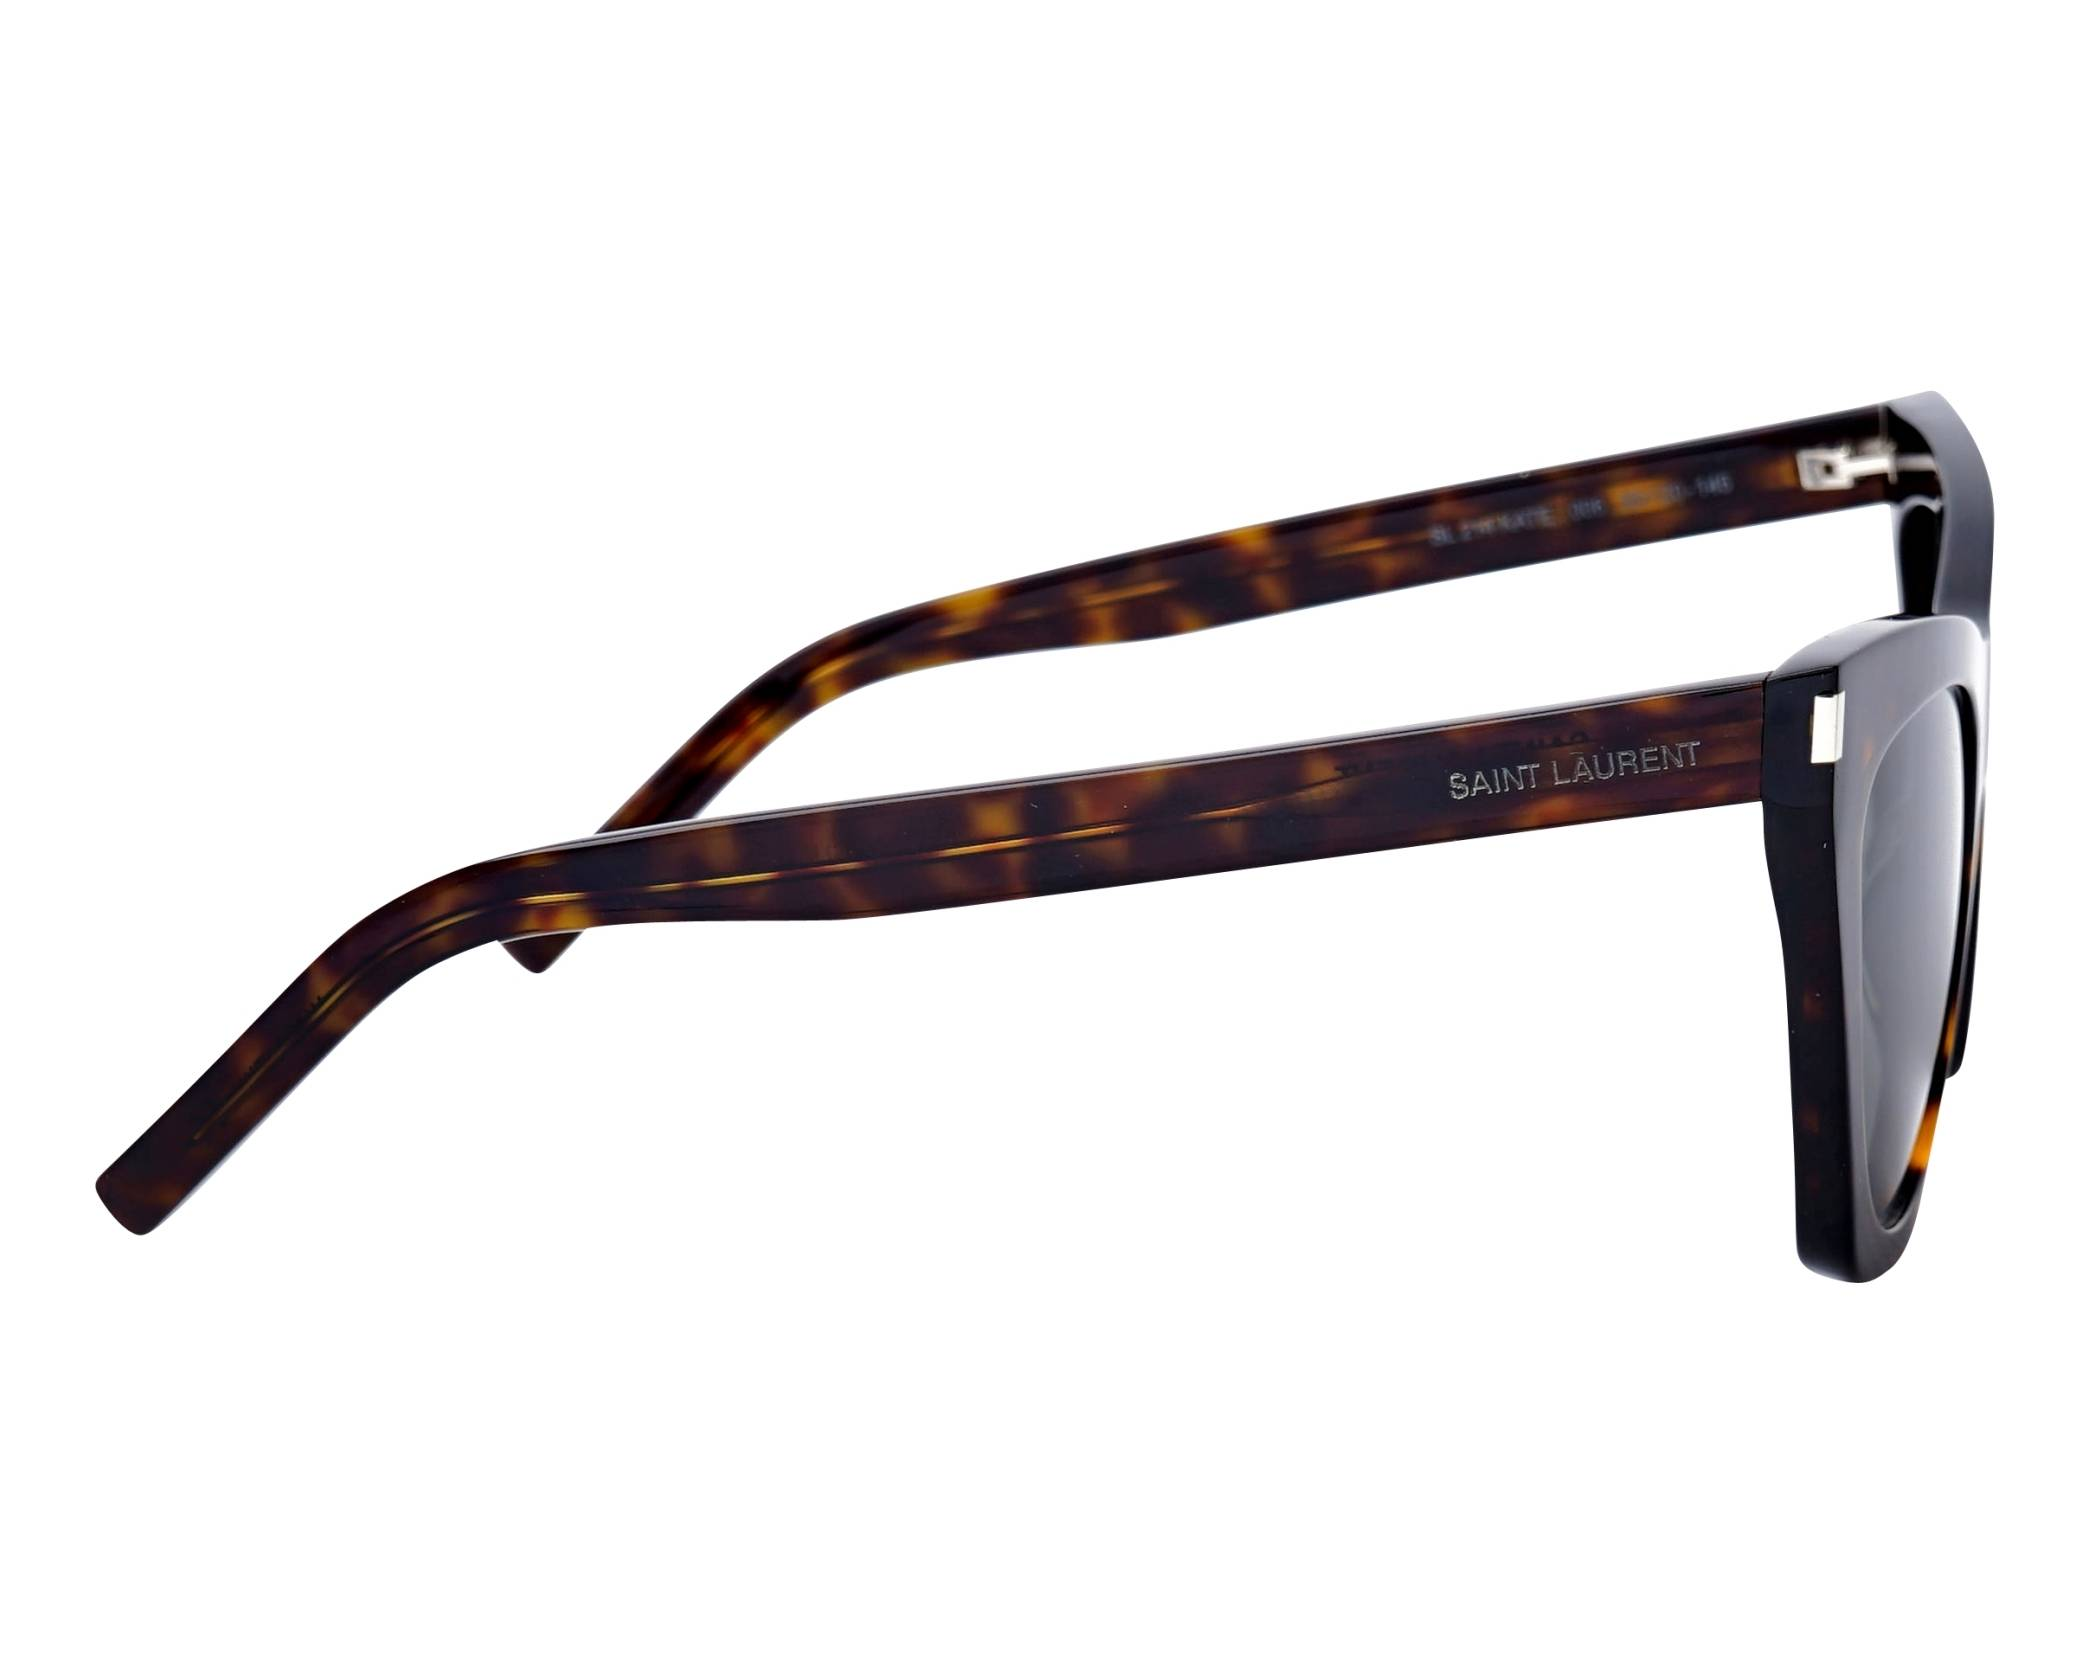 03410002ffe Sunglasses Yves Saint Laurent SL-214 006 55-20 Havana side view